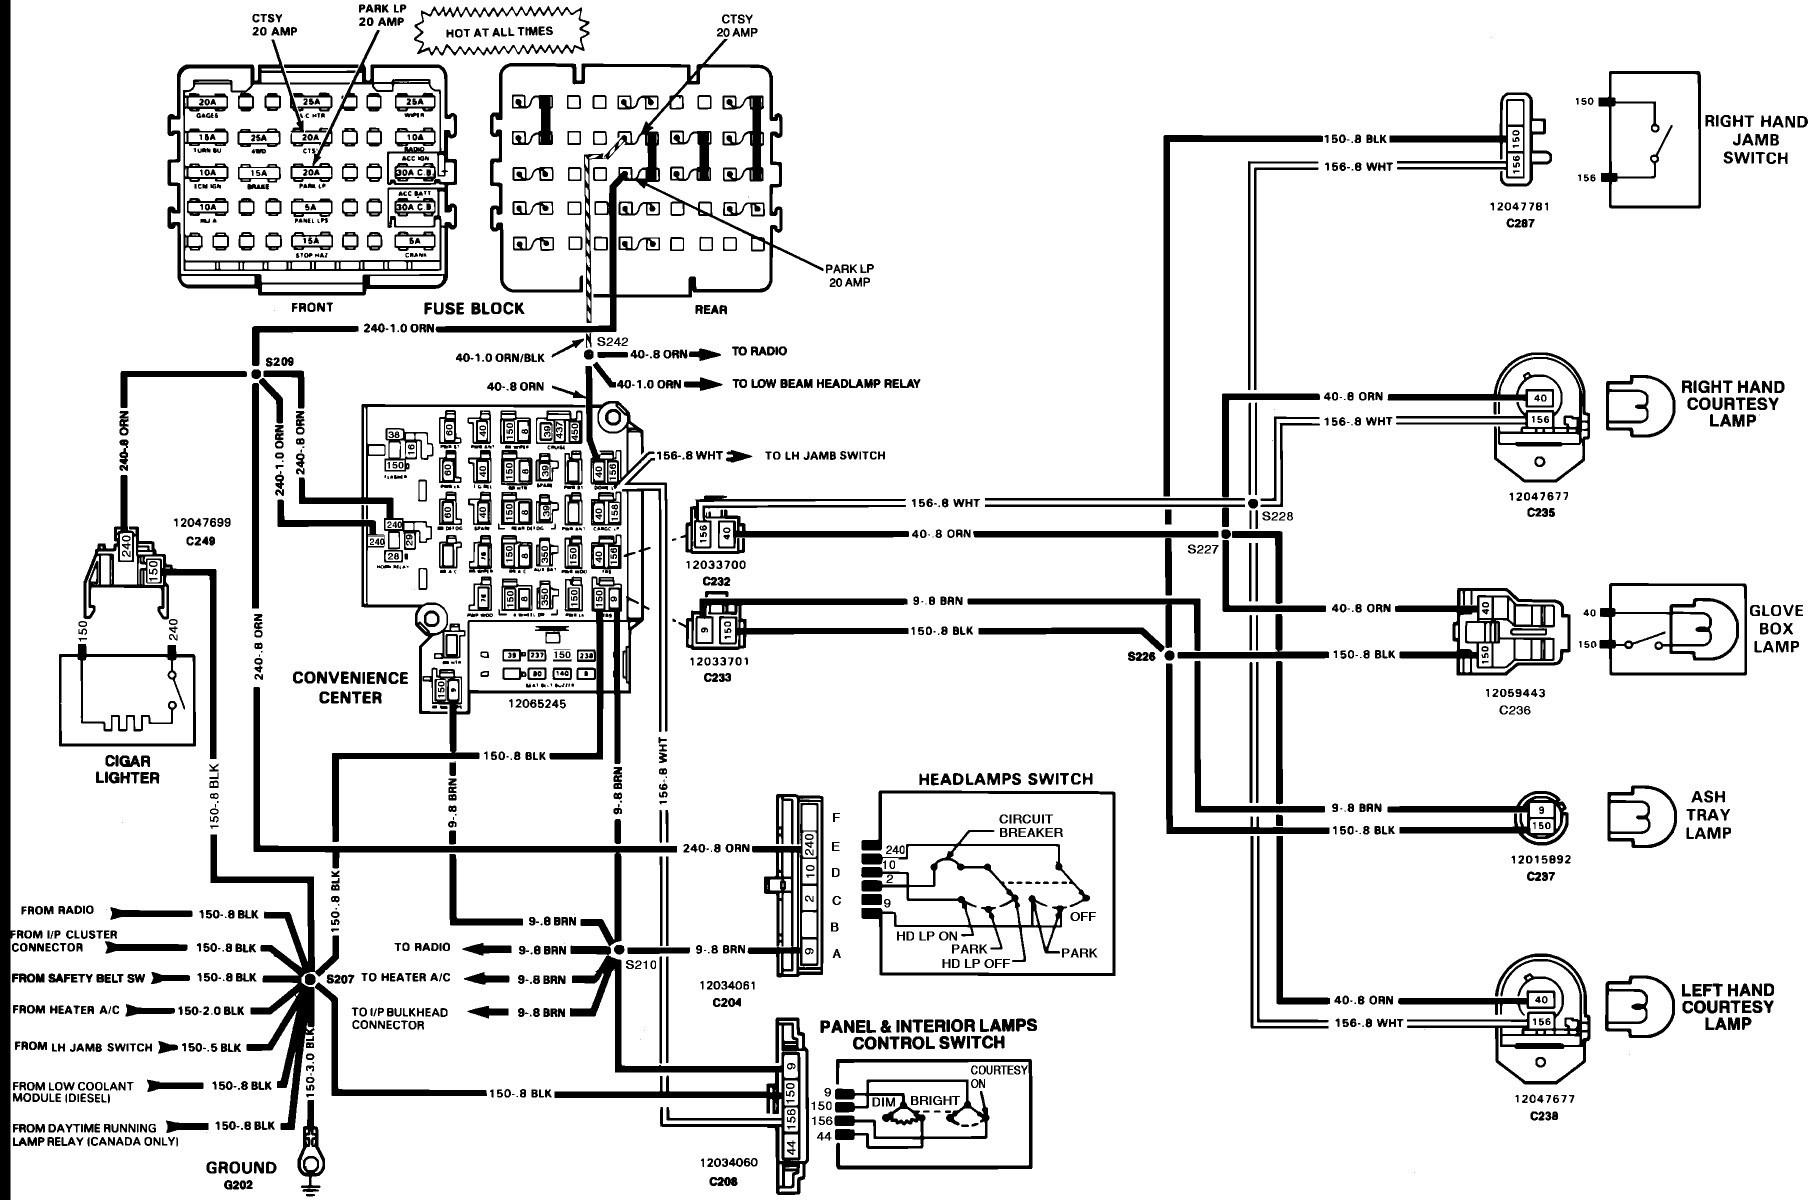 1998 chevy alternator wiring diagram ff 9928  chevy vortec alternator wiring download diagram  ff 9928  chevy vortec alternator wiring